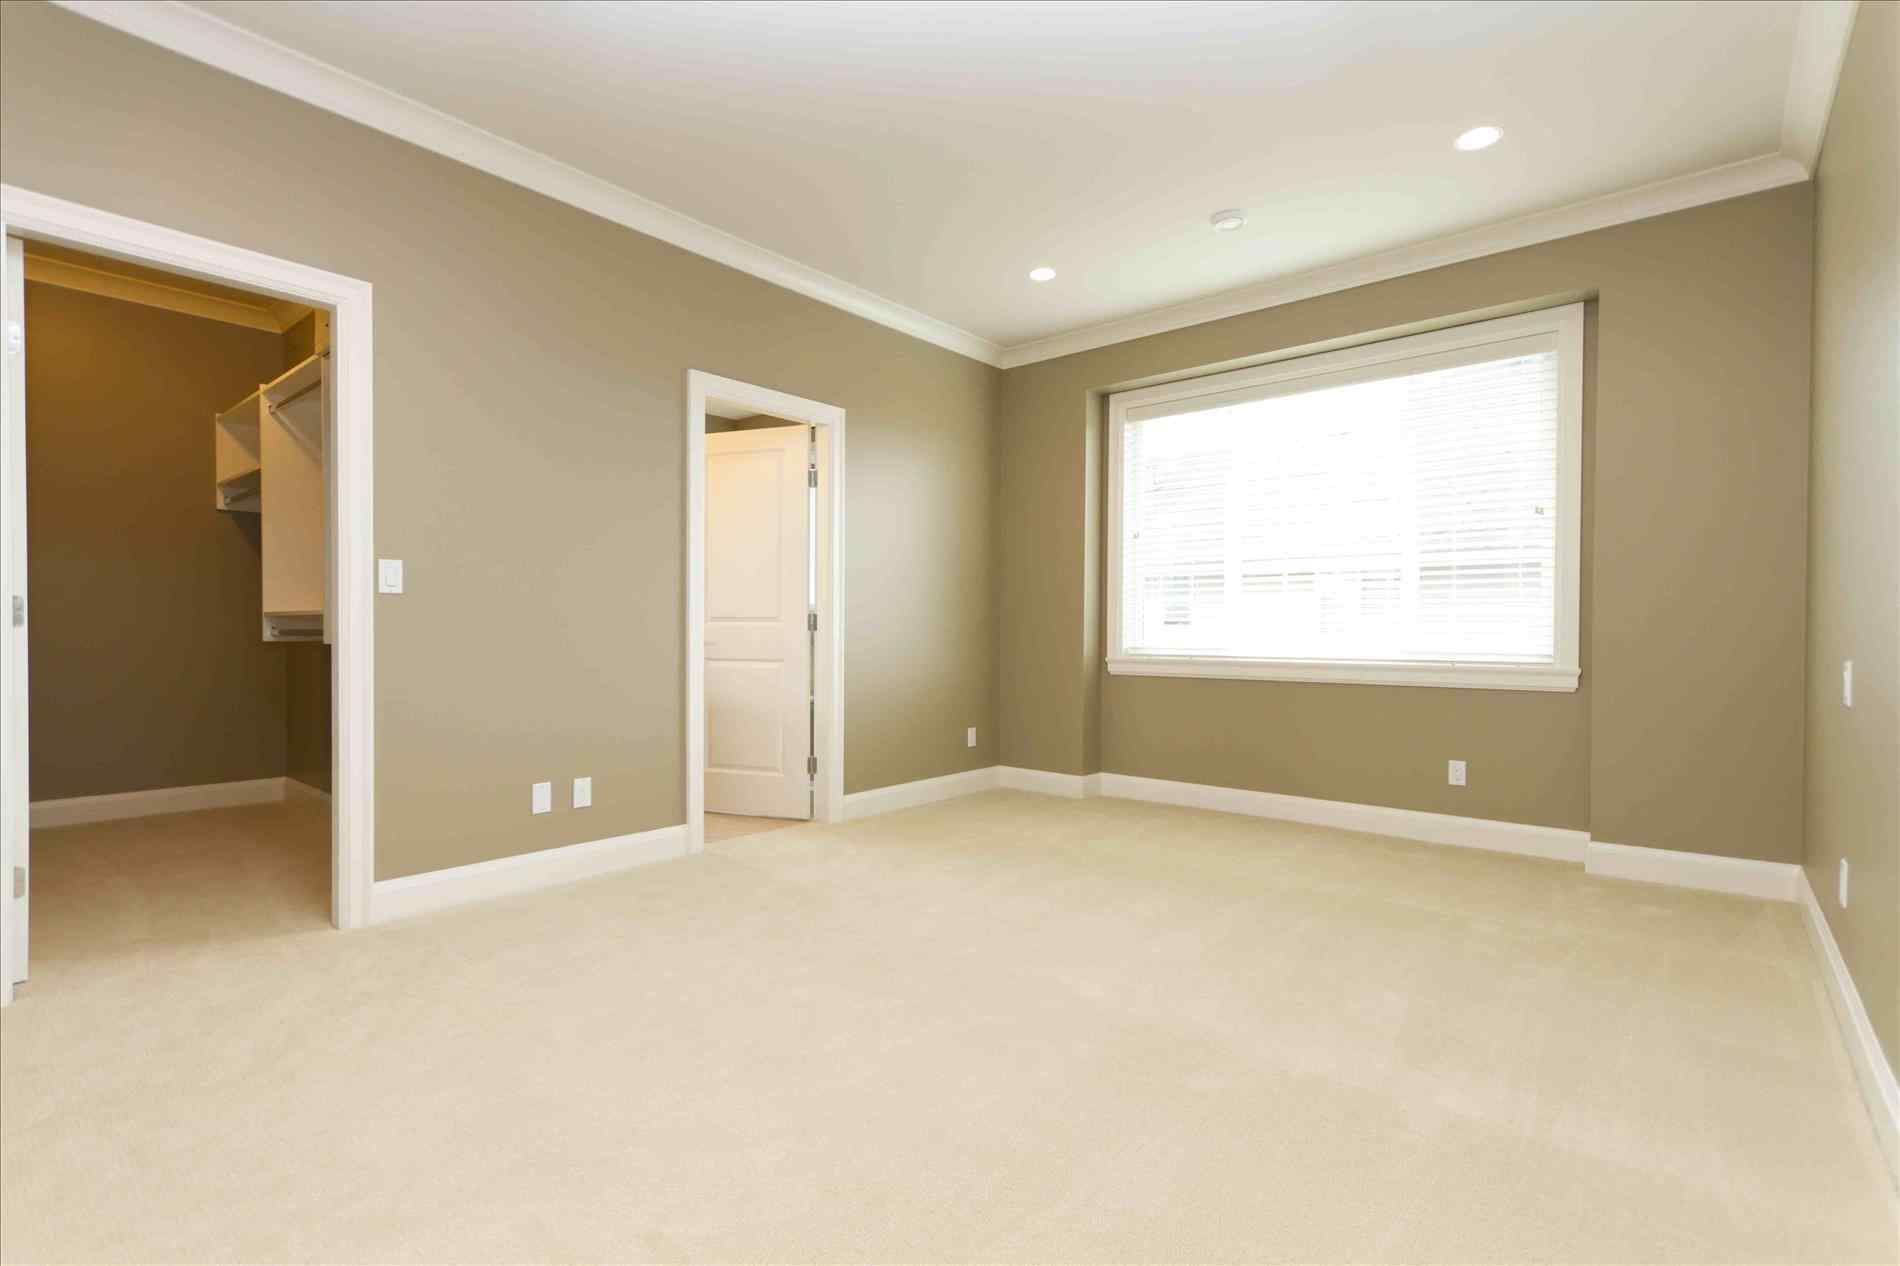 Empty background tristanowin emptyemptybedroomclipartlivingroombackgroundtristanowin. Bedroom clipart living room